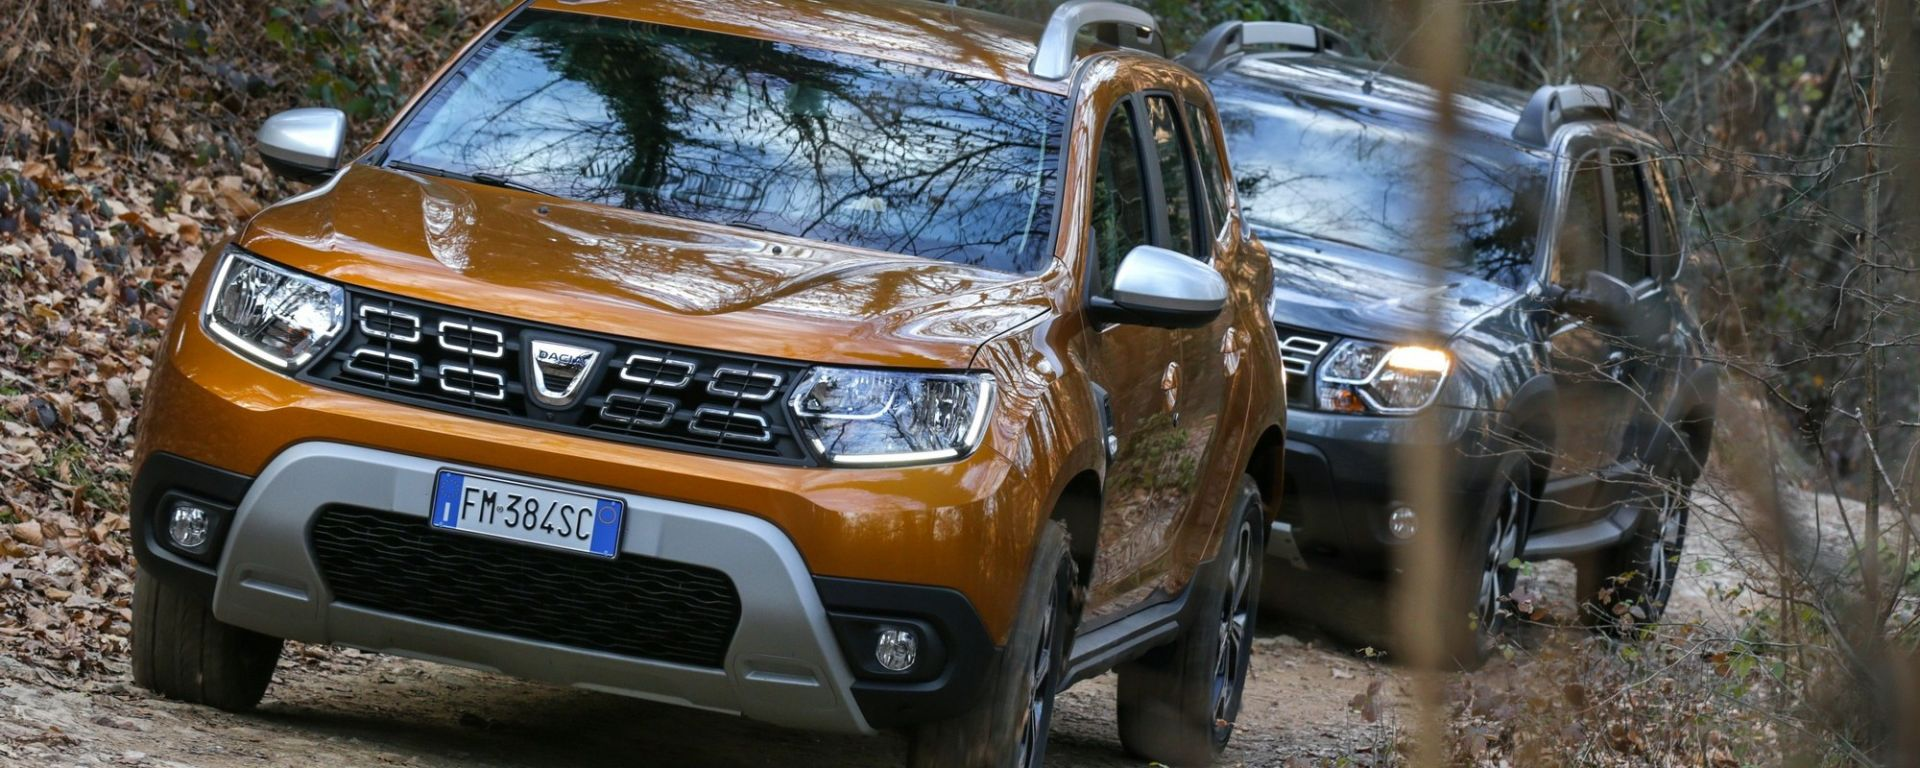 Dacia Duster 2018 vs Dacia Duster Brave2 in offroad